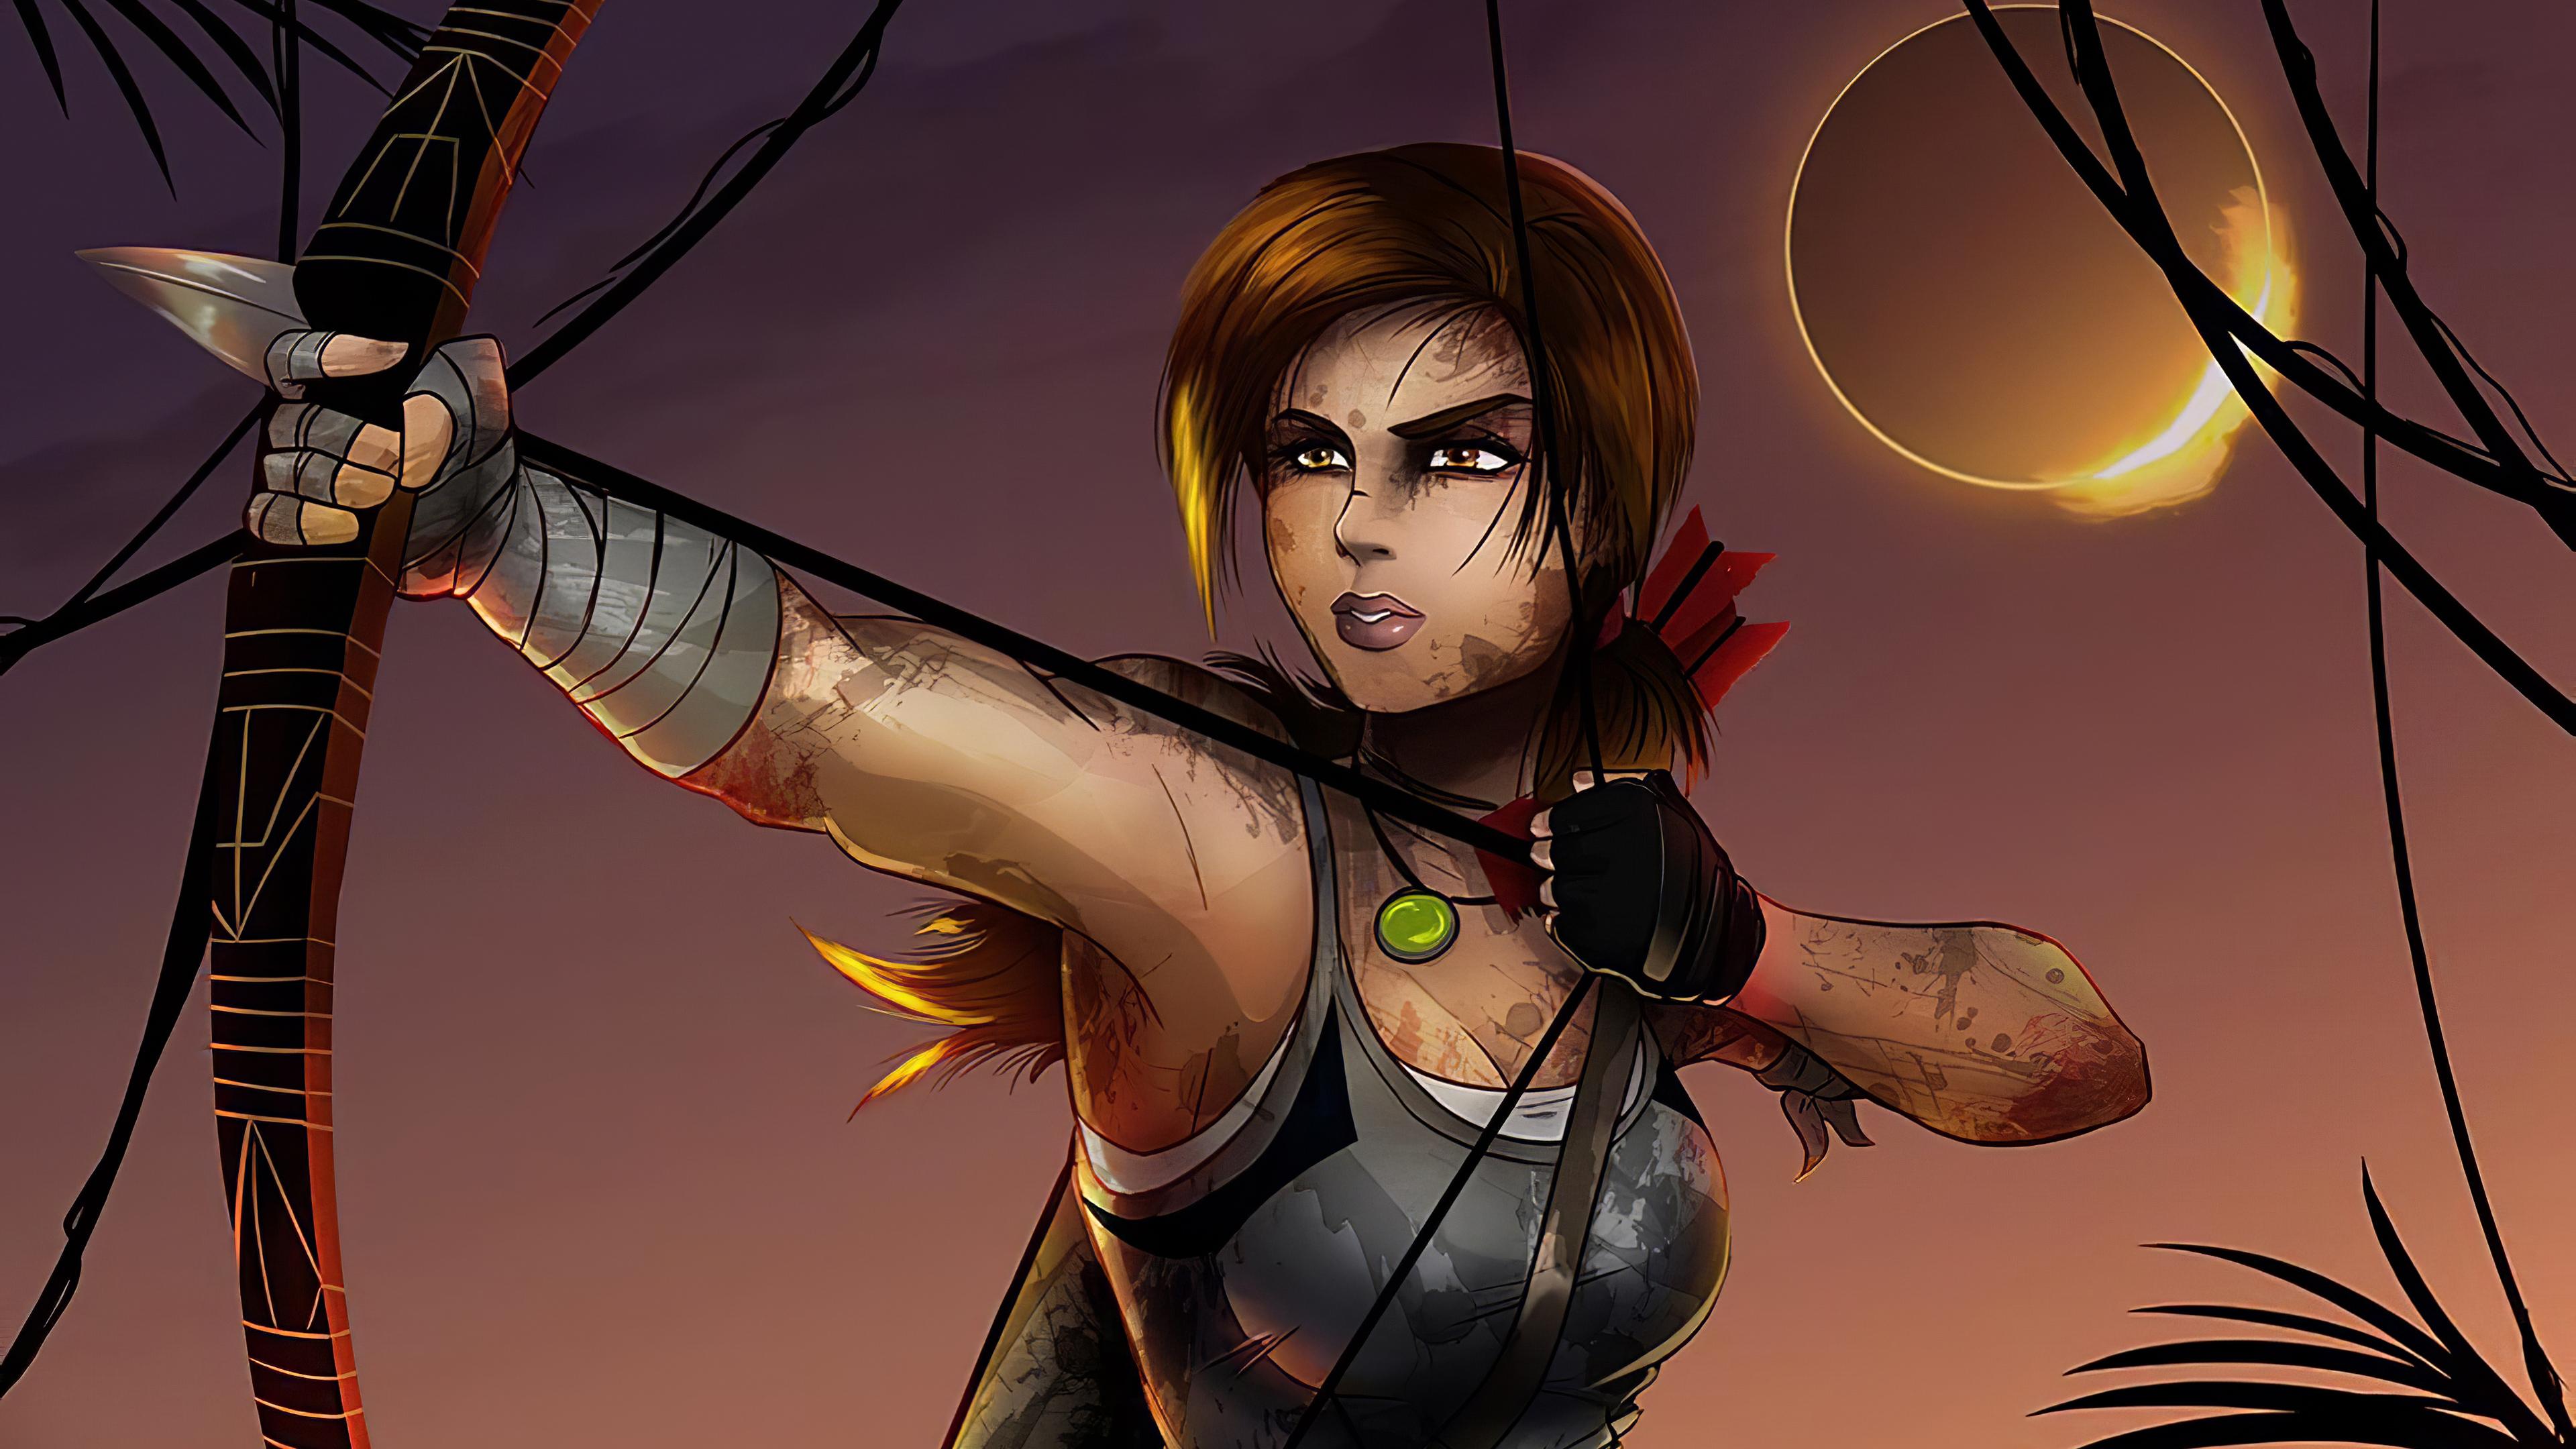 Lara Croft Shadow Of The Tomb Raider Artwork 4k Hd Games